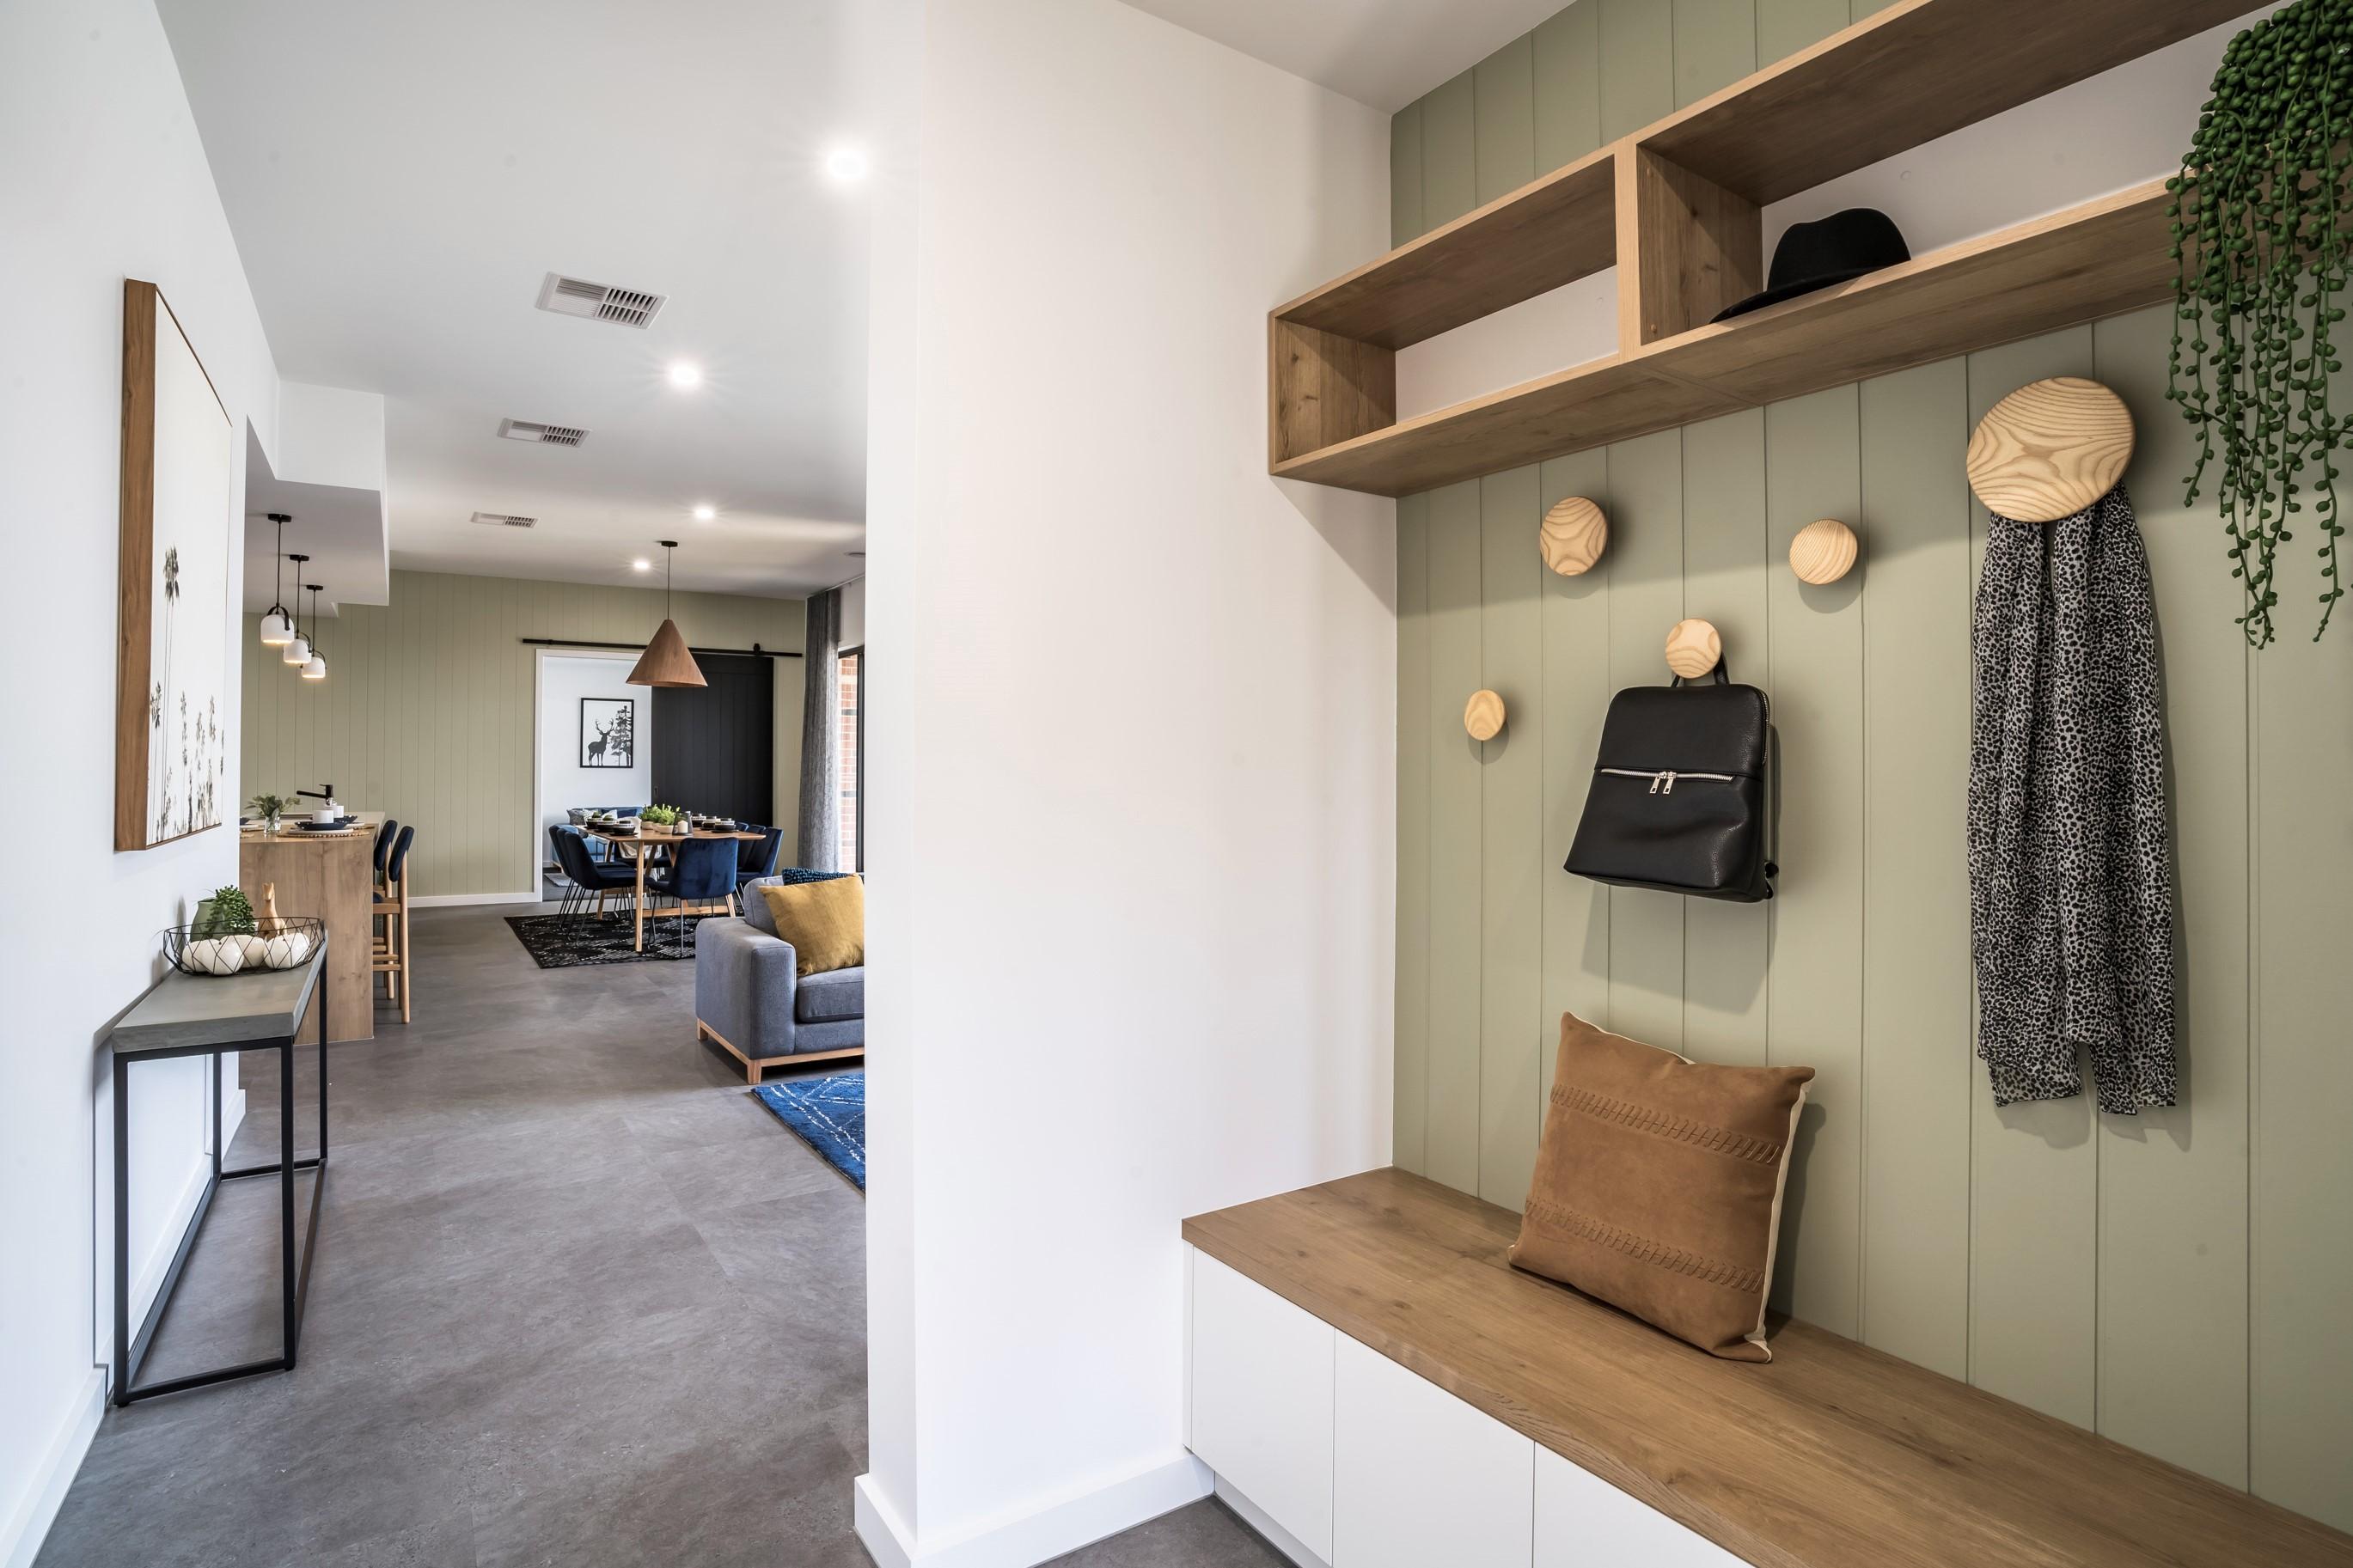 mudroom-entry-alatalo bros- display home-the rosella-home design-uinterior design-alatalo interiors